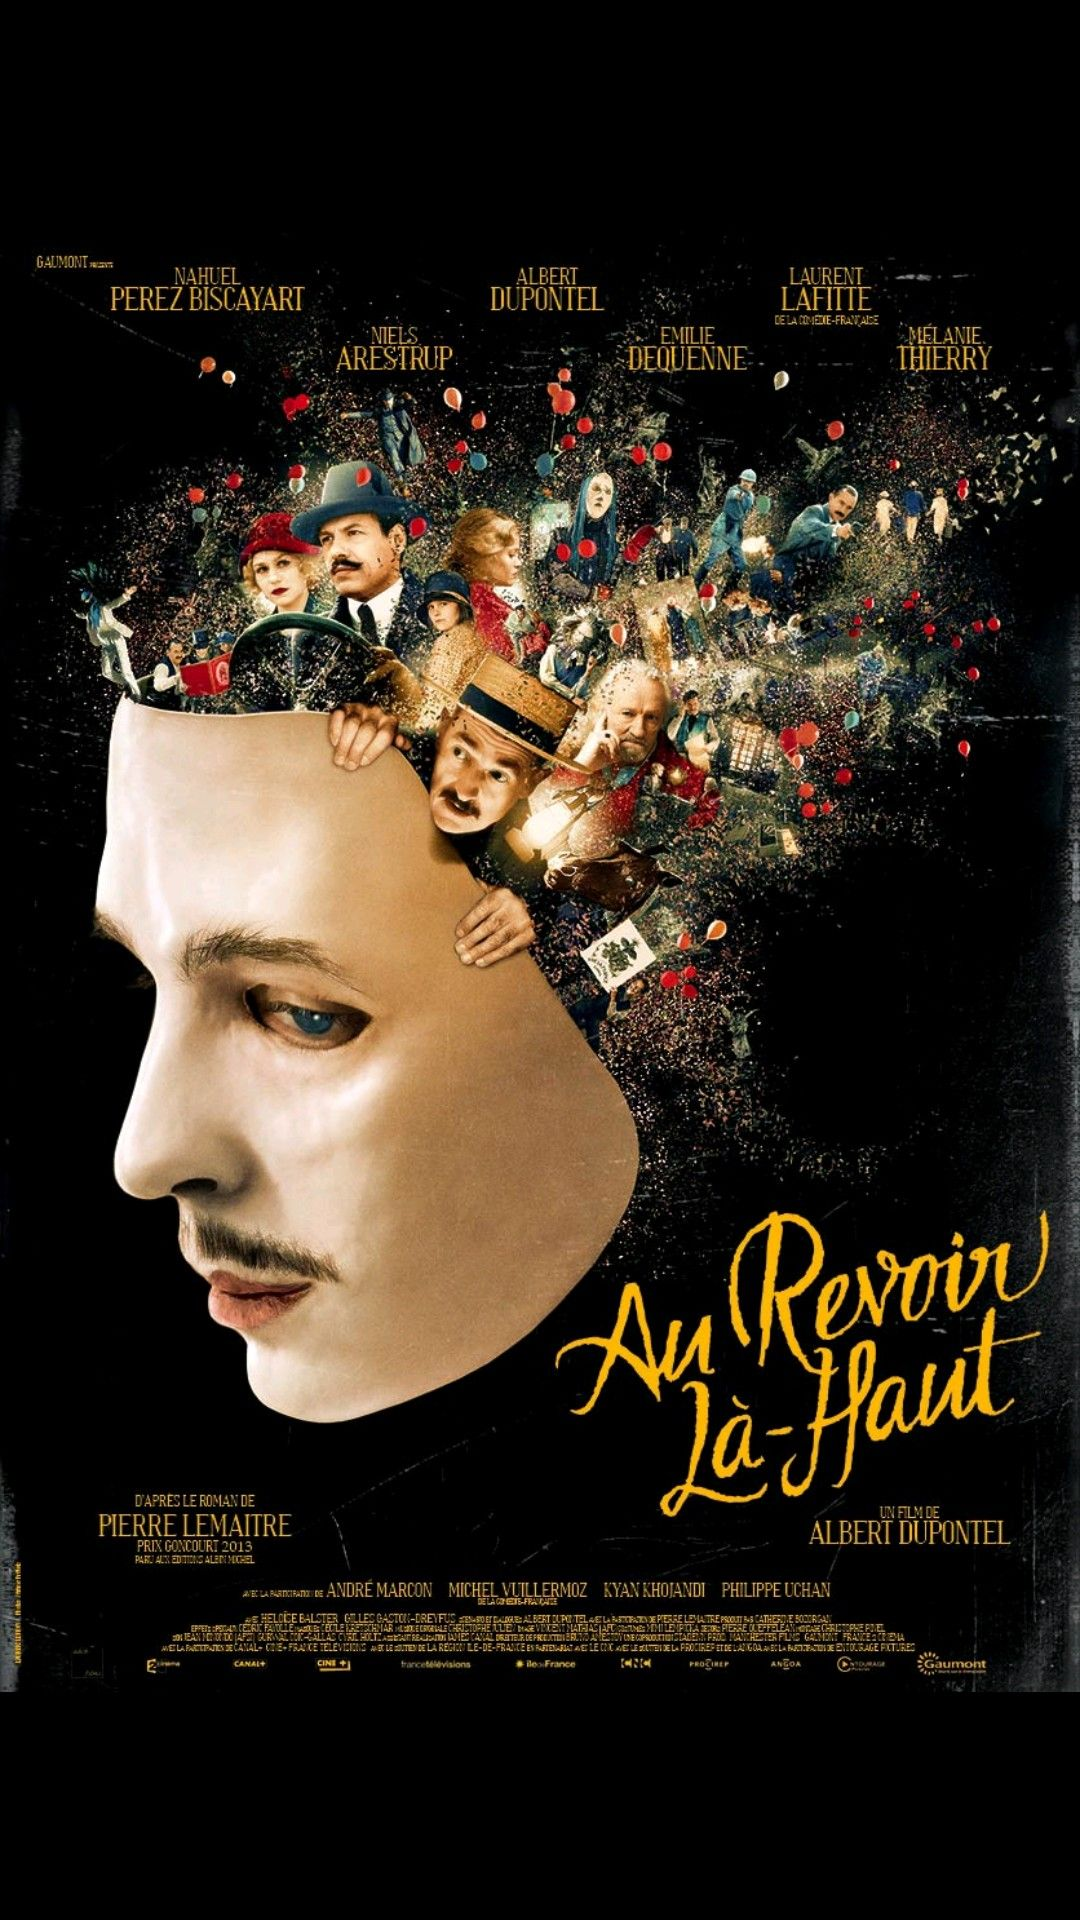 Au revoir là-haut/See You Up There (2017-France) dir. Albert Dupontel